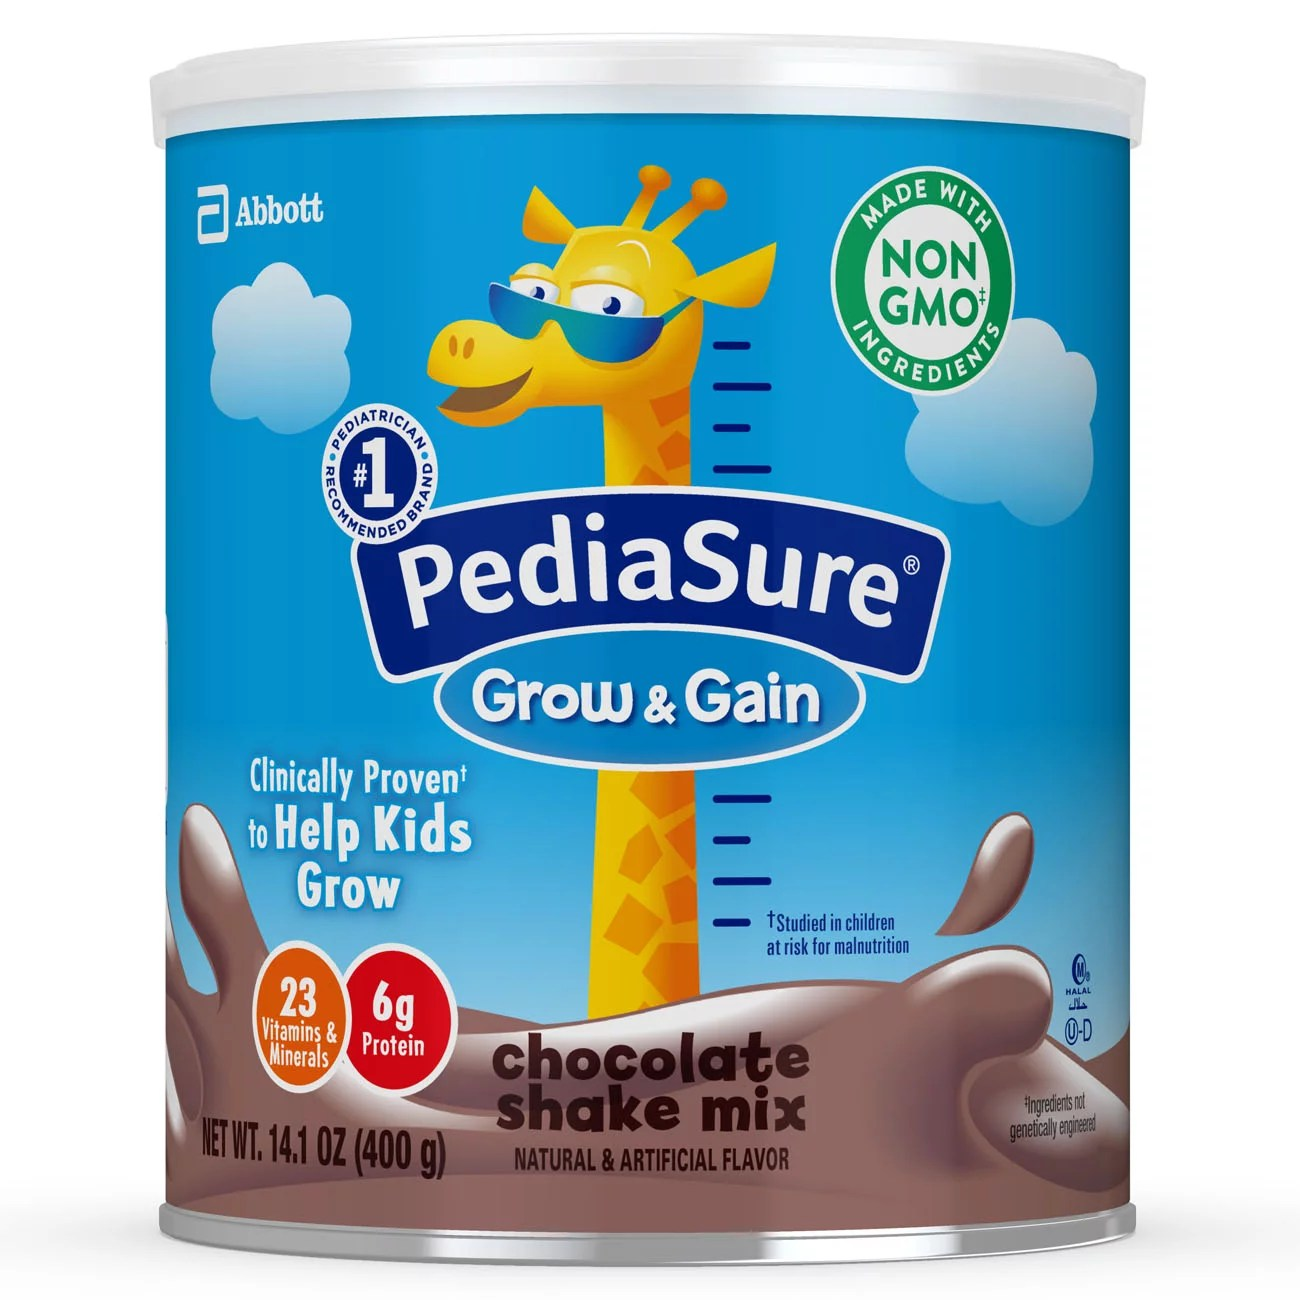 PediaSure Grow & Gain Non-GMO & Gluten-Free Shake Mix Powder, Nutritional Shake For Kids, With Protein, Probiotics, DHA, Antioxidants*, and Vitamins & Minerals, Chocolate, 14.1 oz, 3 Count